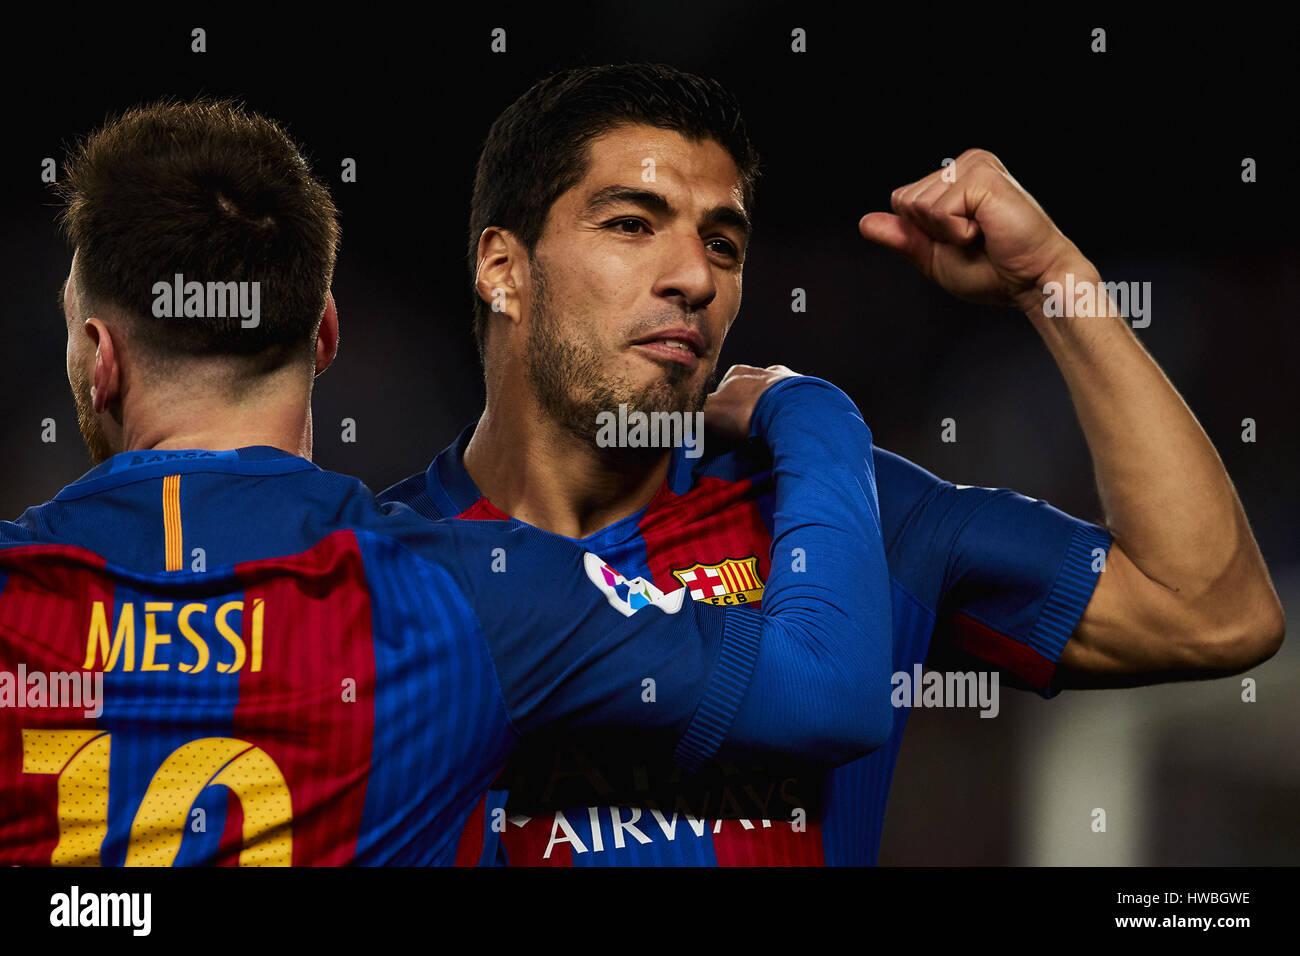 Barcelona, España. 19 Mar, 2017. Lionel Messi (FC Barcelona) celebra con su compañero Luis Suárez (FC Barcelona), Foto de stock